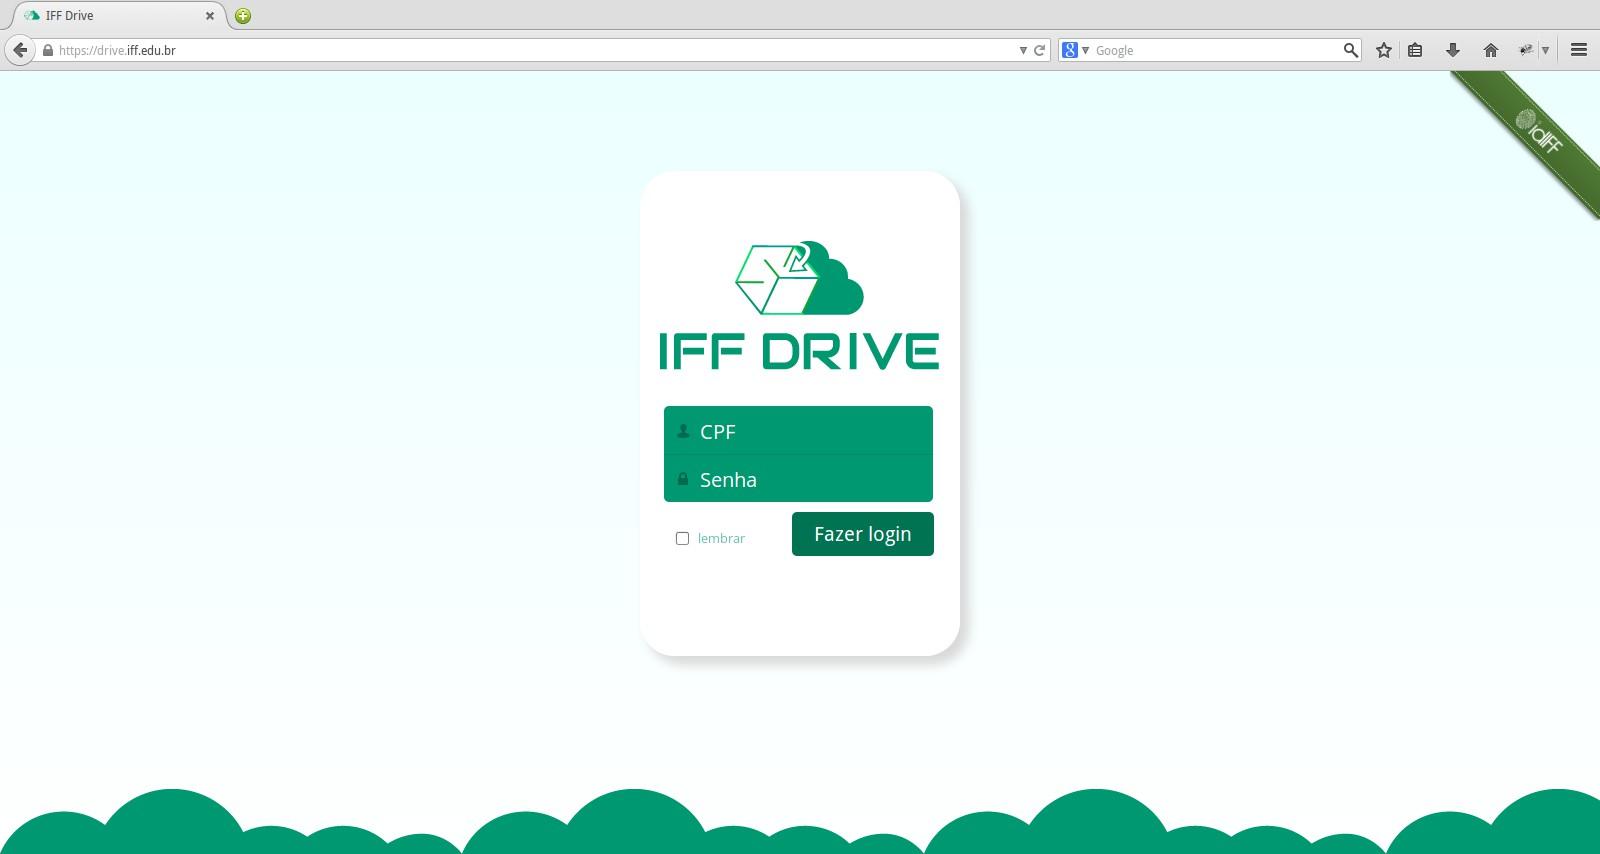 iffdrive1